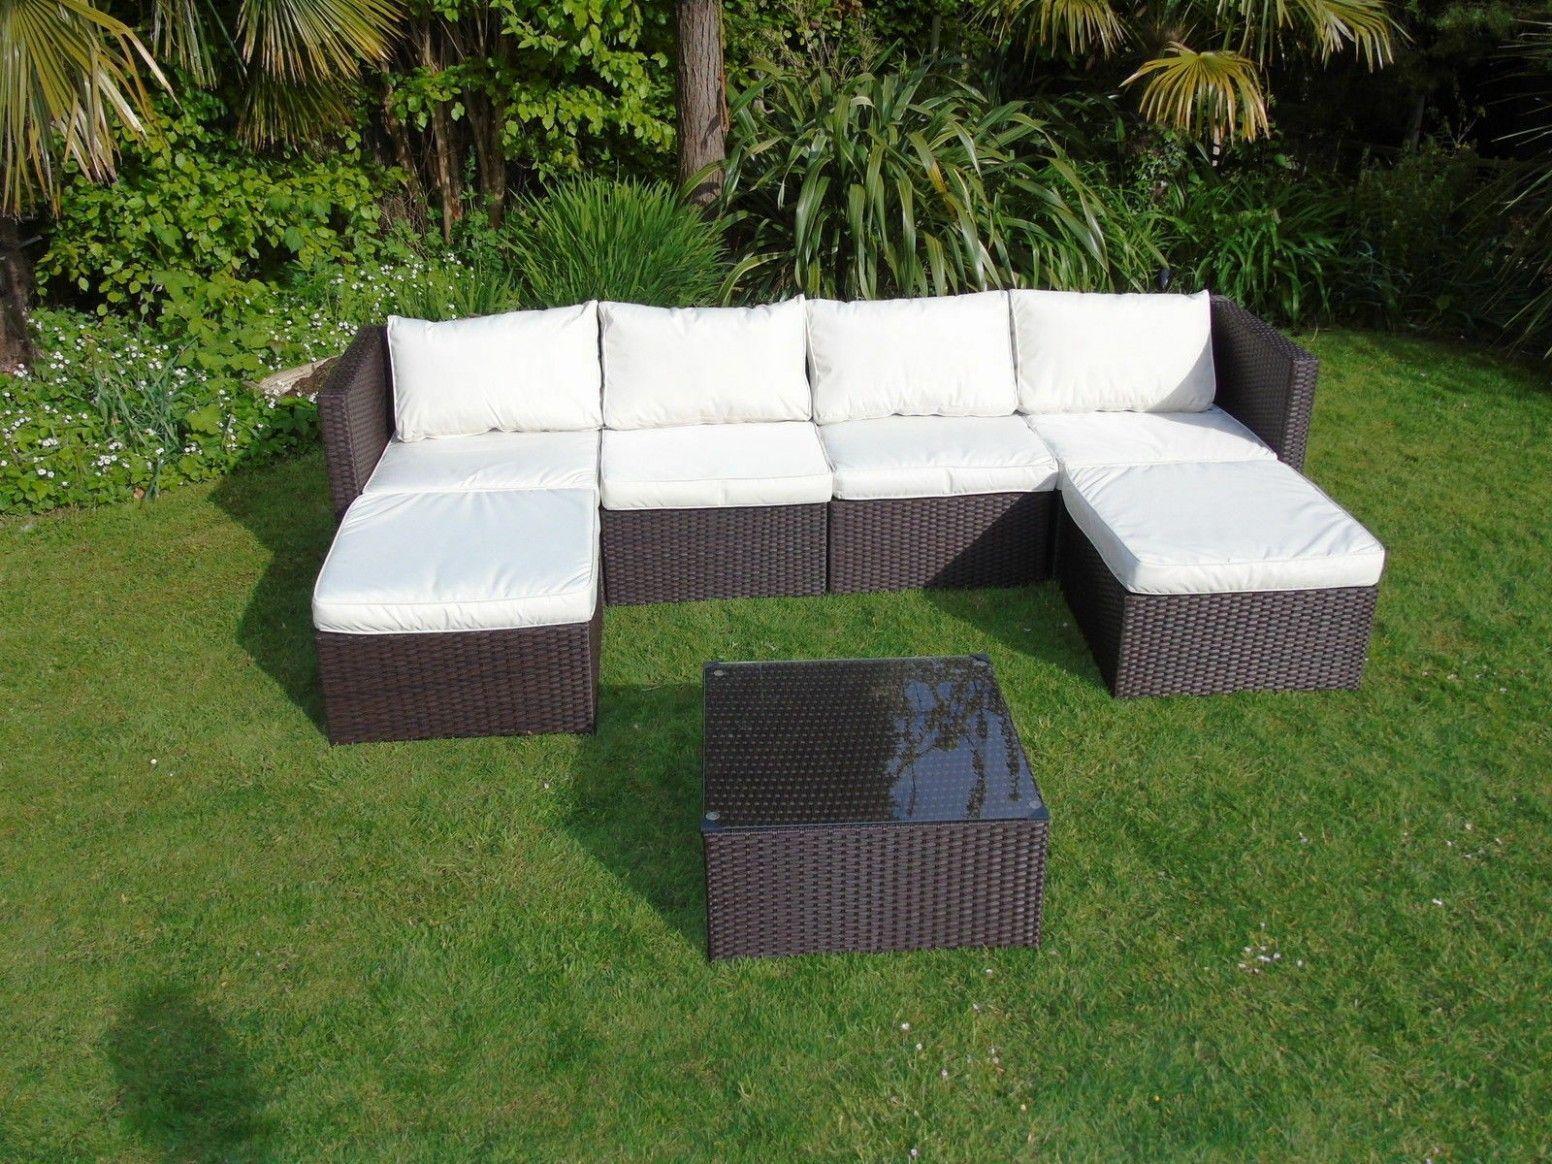 asda garden furniture Garden Furniture On Ebay#asda #ebay